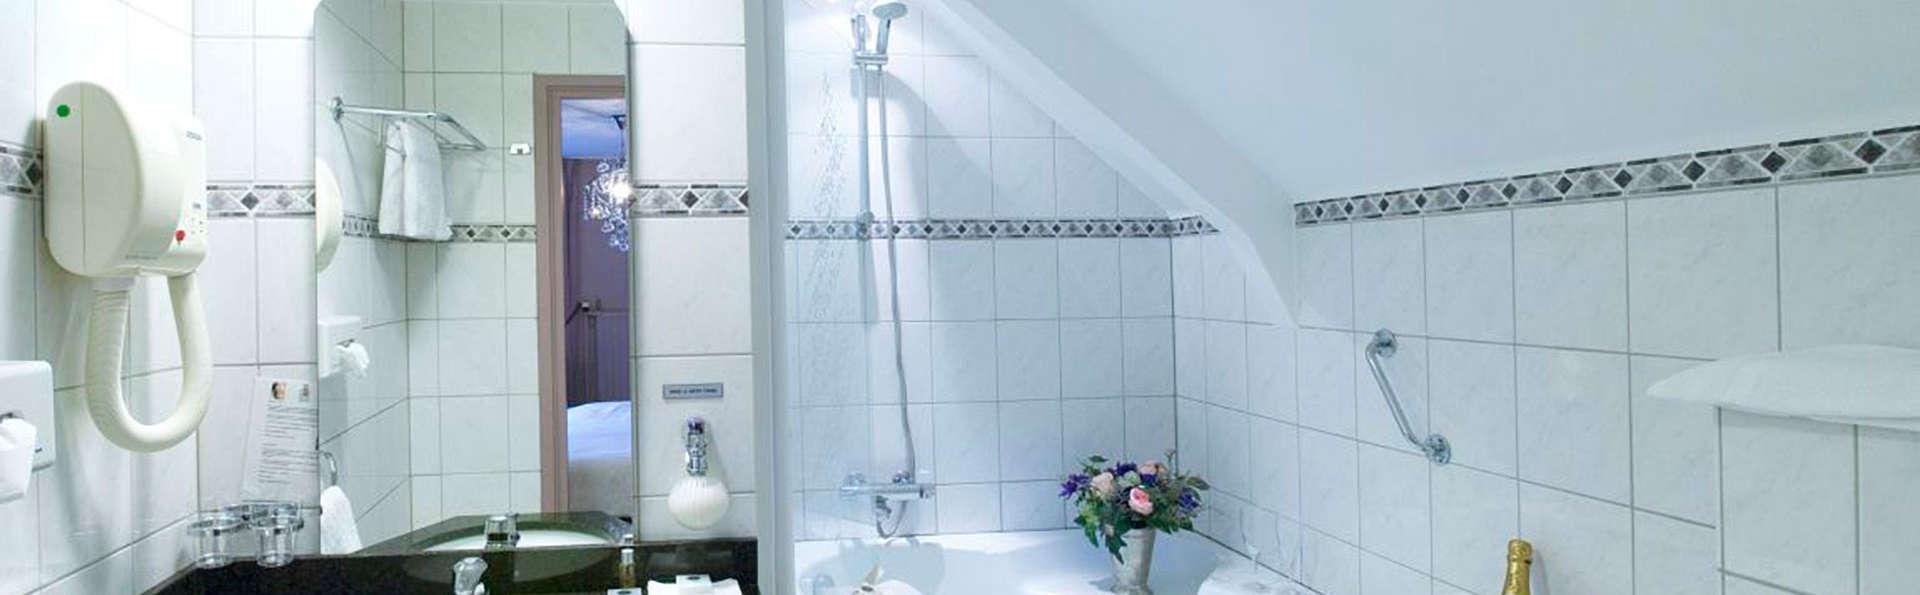 Hotel 't Paviljoen - EDIT_bathroom.jpg